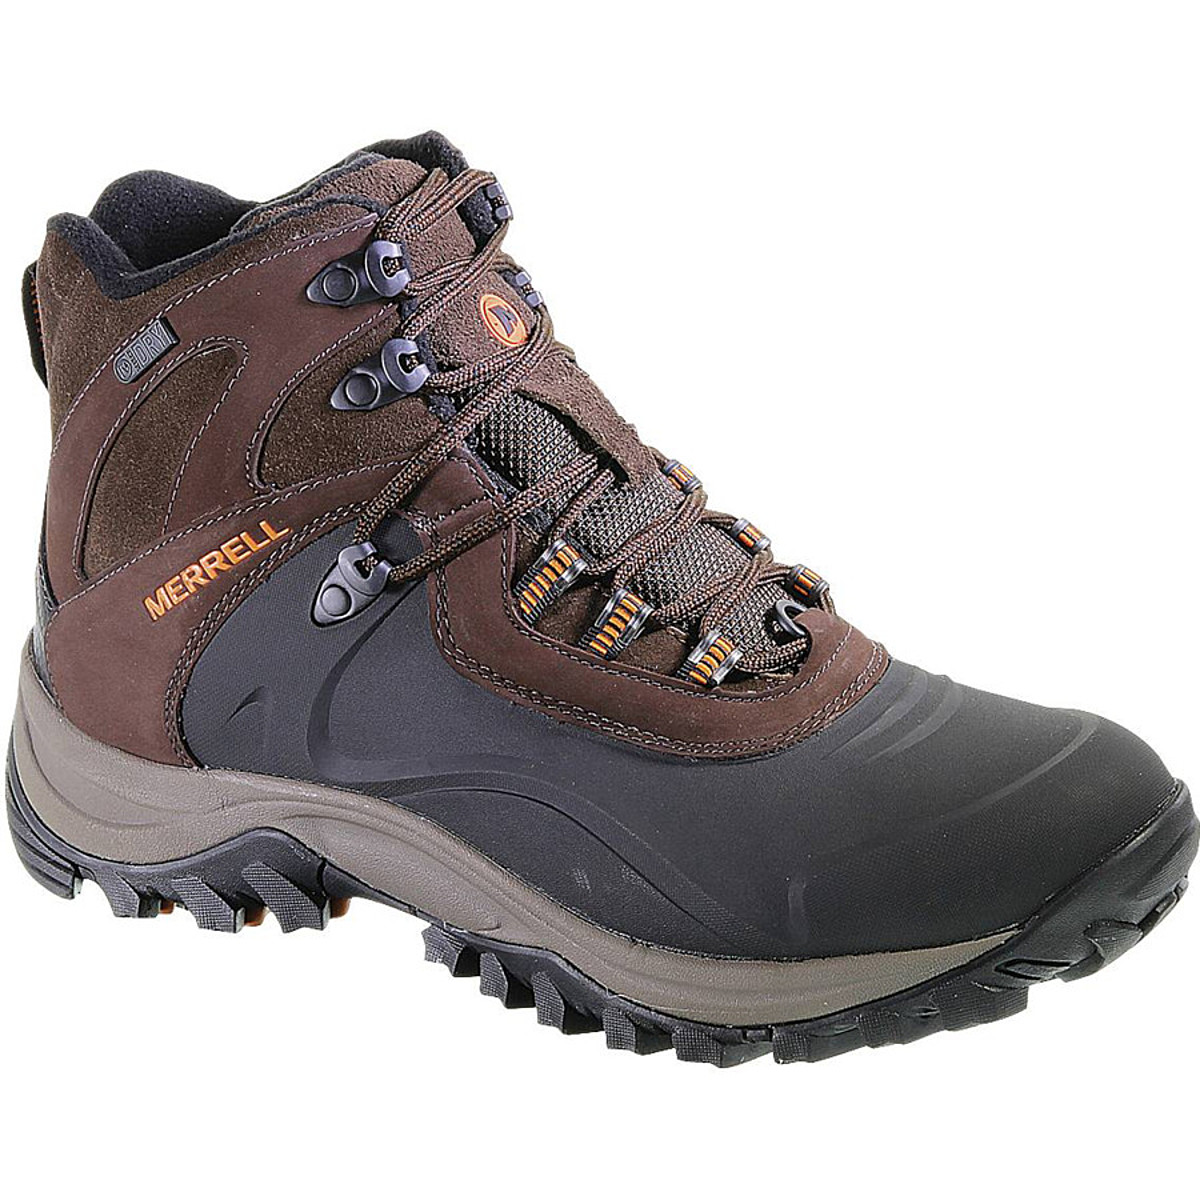 photo: Merrell Iceclaw Mid Waterproof hiking boot